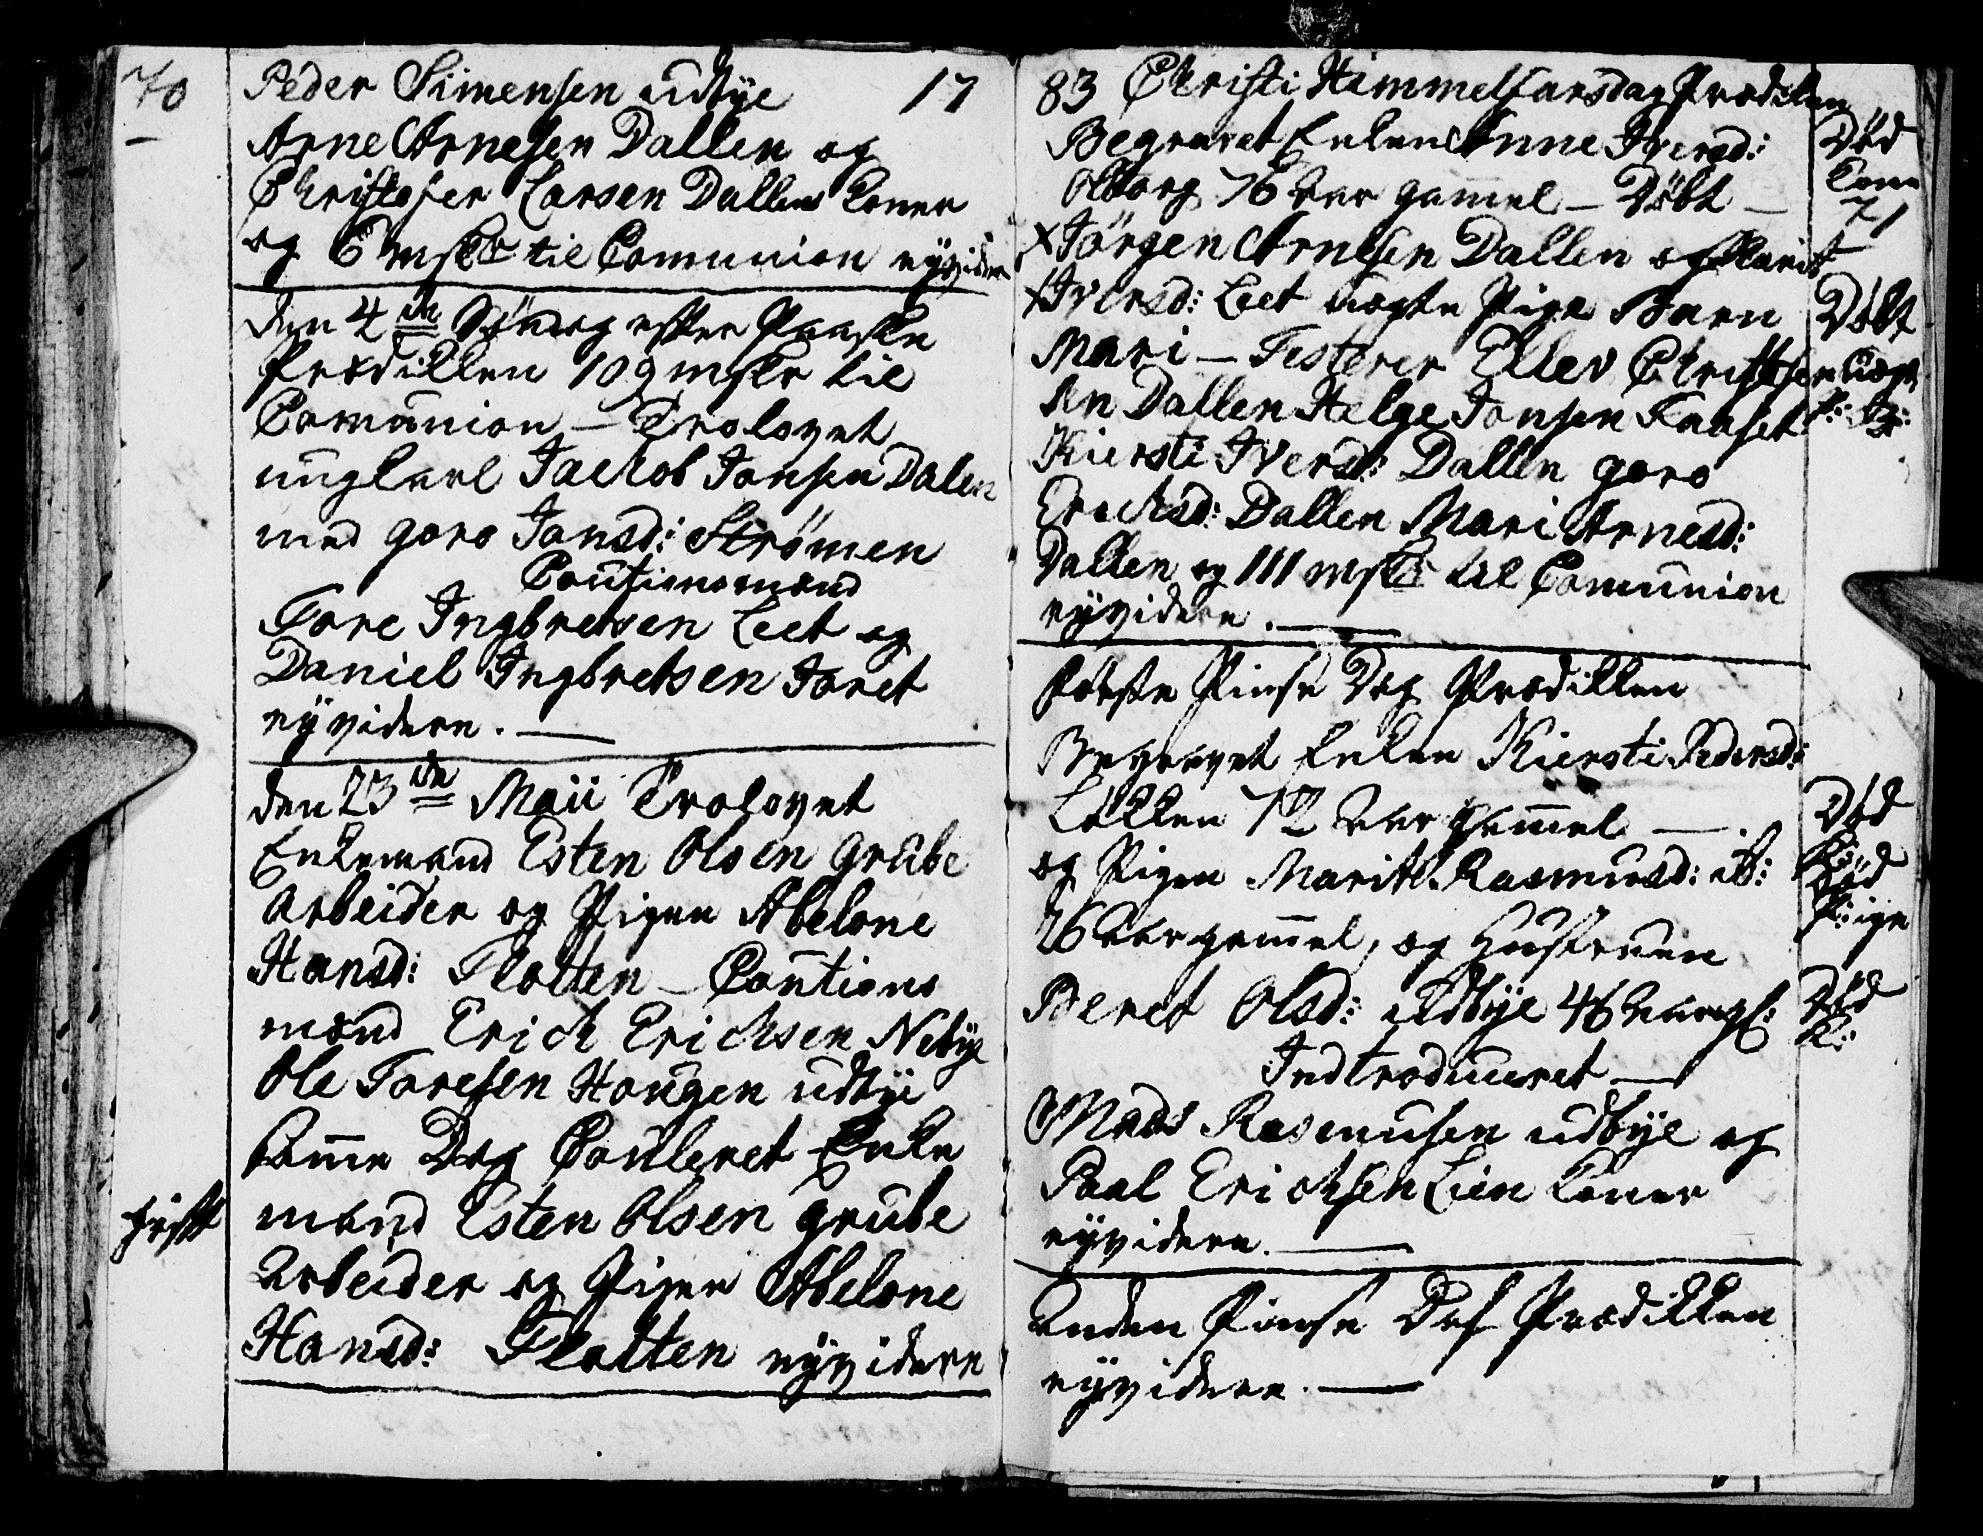 SAH, Tynset prestekontor, Ministerialbok nr. 12, 1780-1784, s. 70-71